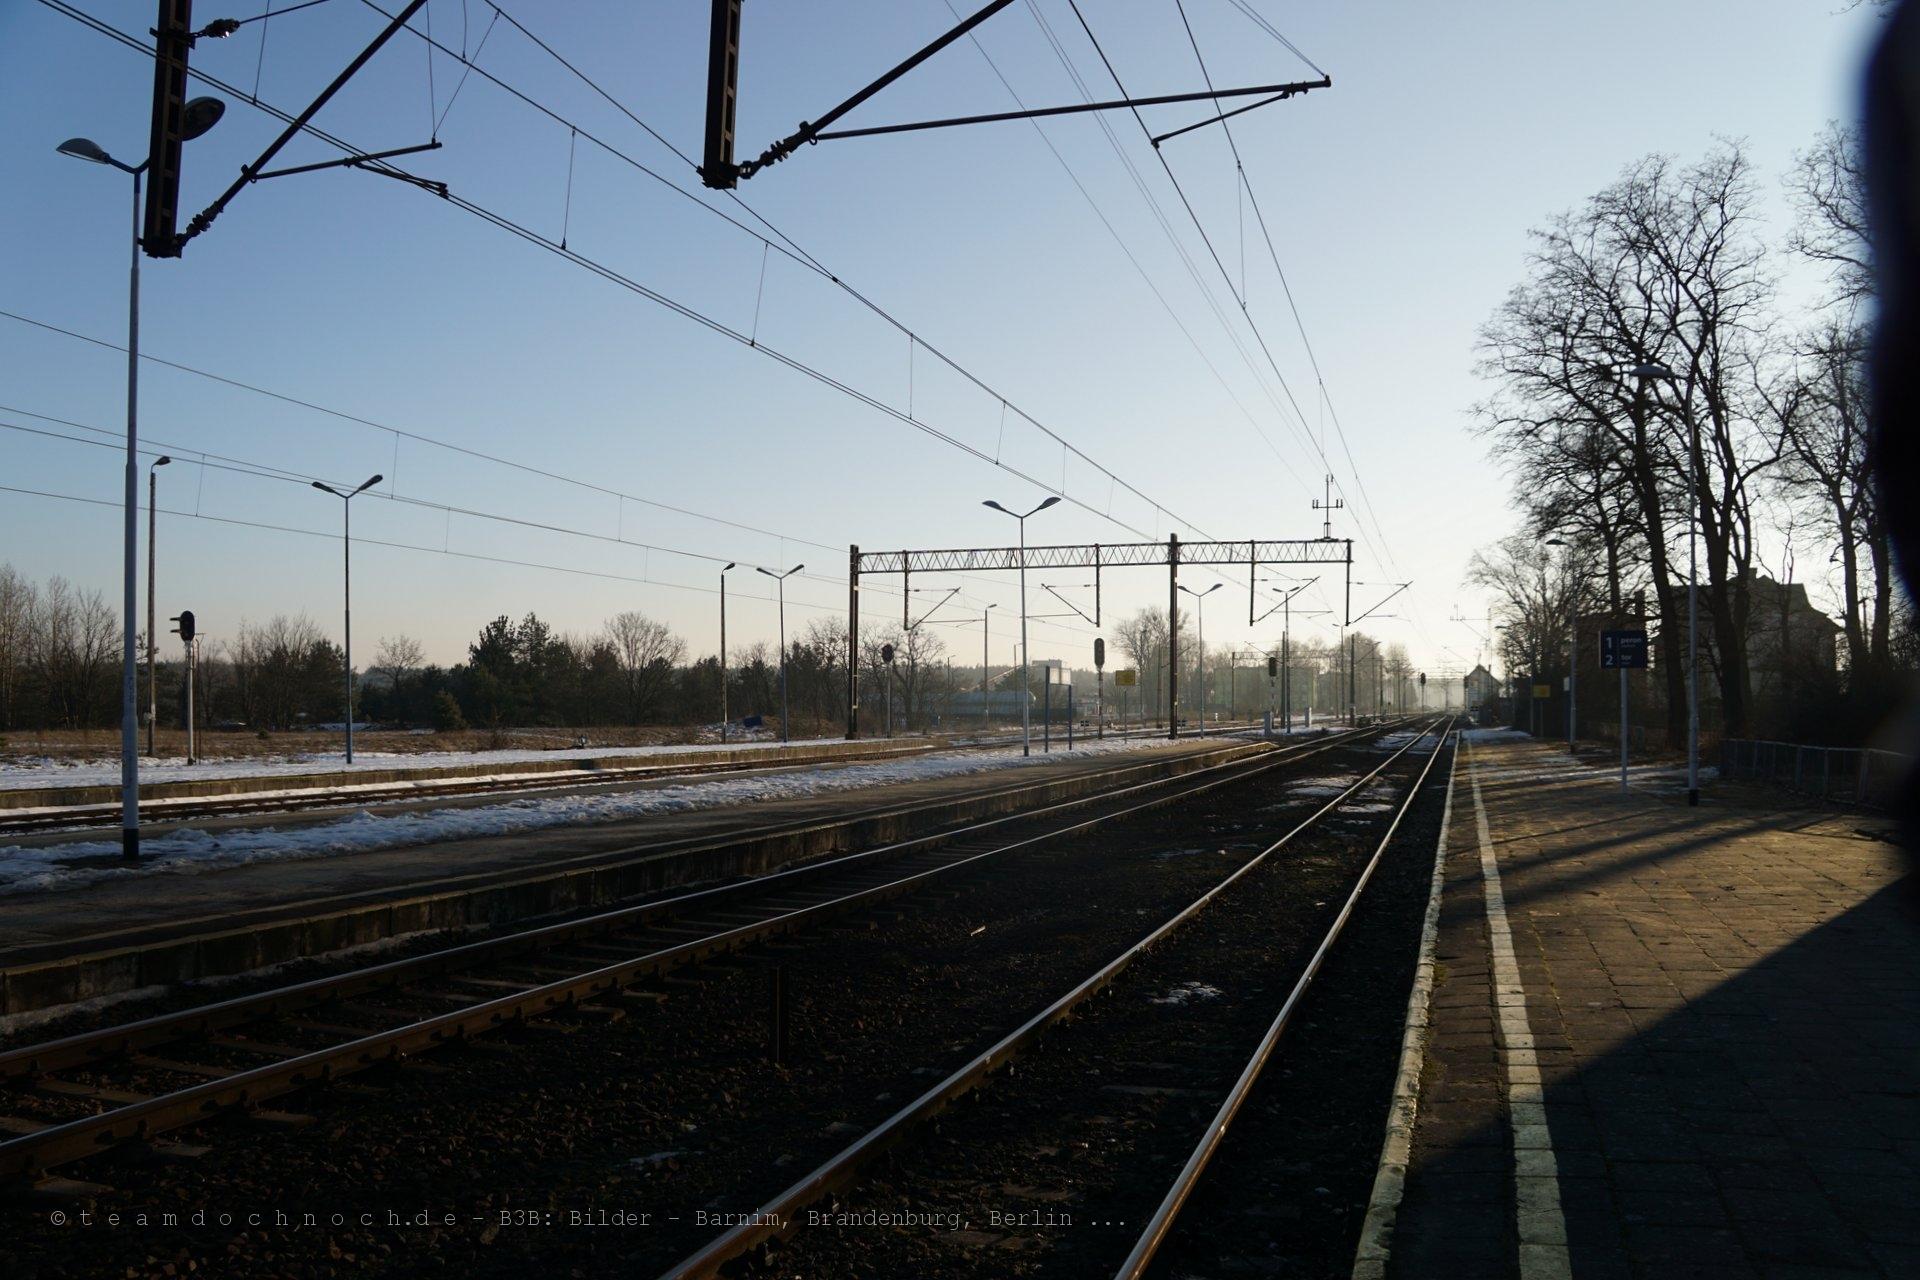 Bahnhof Jastrowie